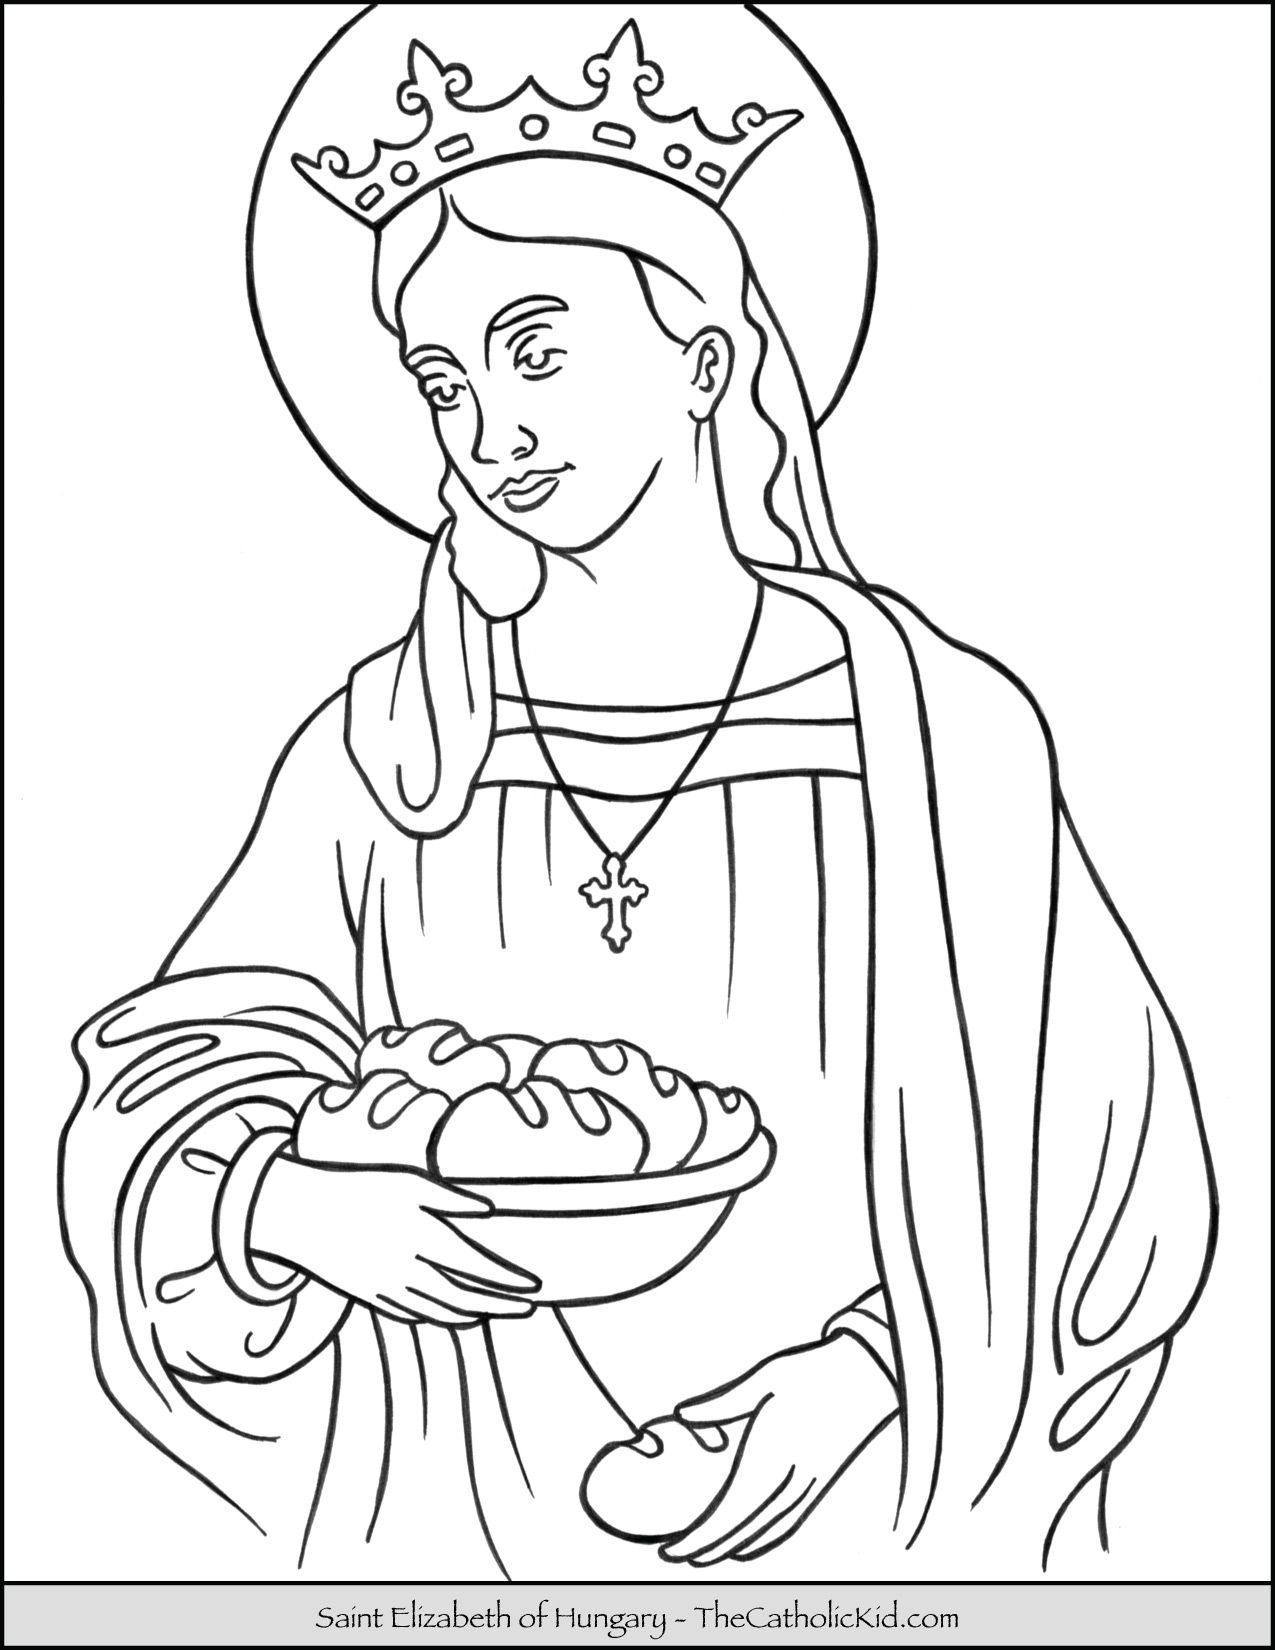 Saint Elizabeth Of Hungary Coloring Page Saint Elizabeth Of Hungary Saint Elizabeth Coloring Pages